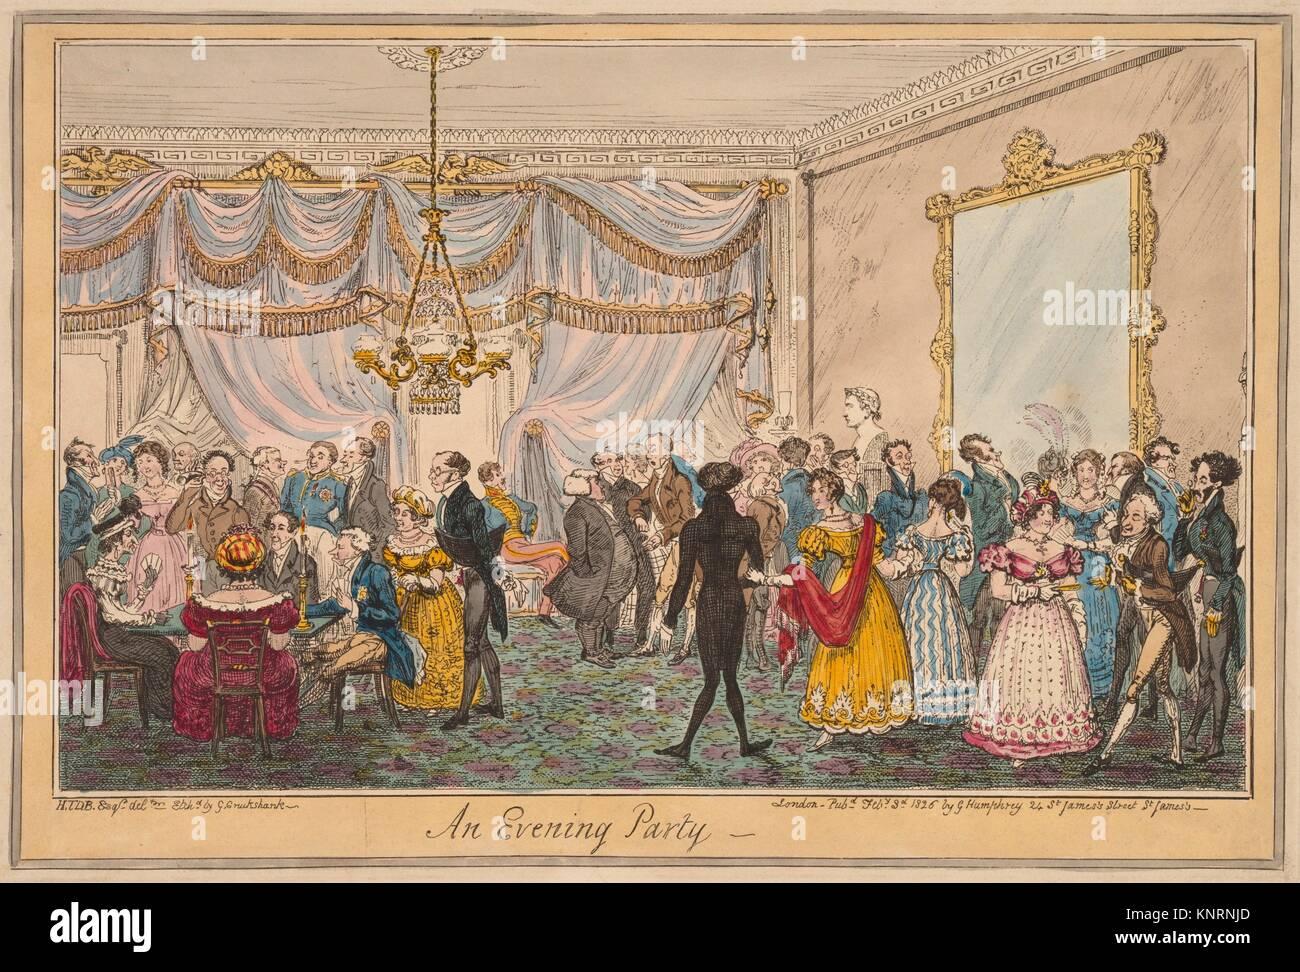 An Evening Party. Artist: George Cruikshank (British, London 1792-1878 London); Artist: After H.T.D.B. (British, Stock Photo